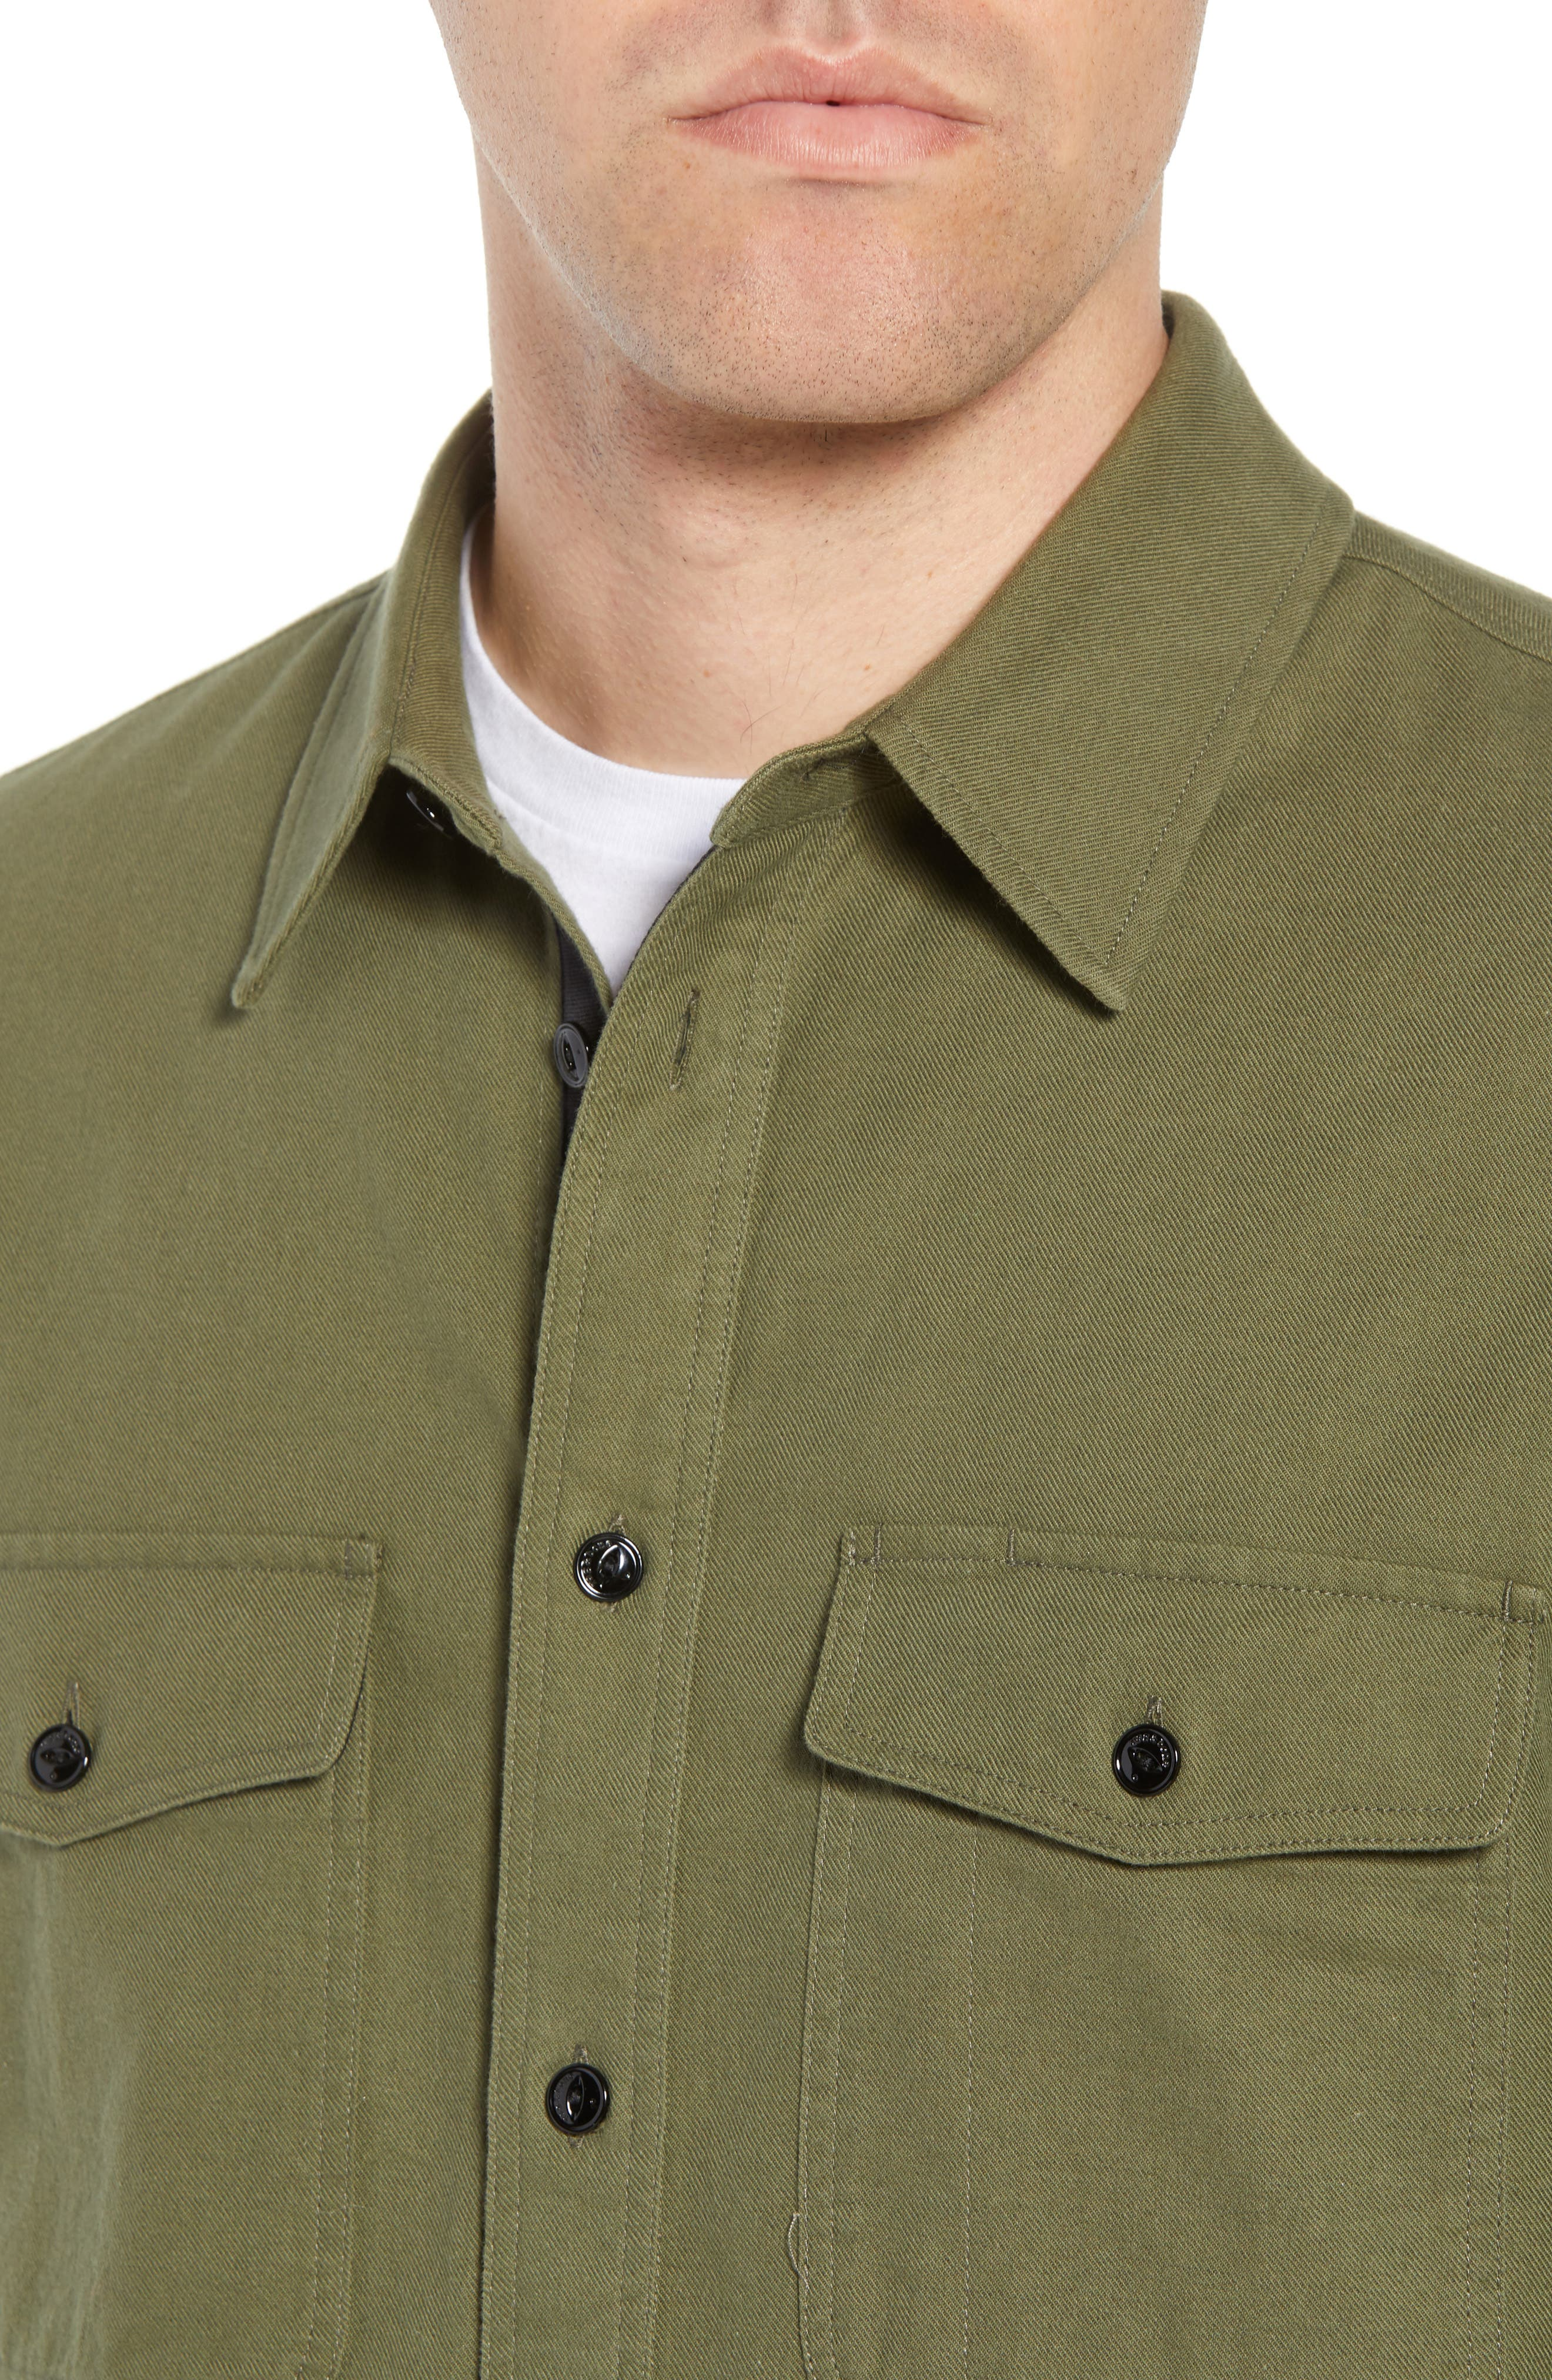 rag + bone Jack Slim Fit Plaid Sport Shirt,                             Alternate thumbnail 4, color,                             315